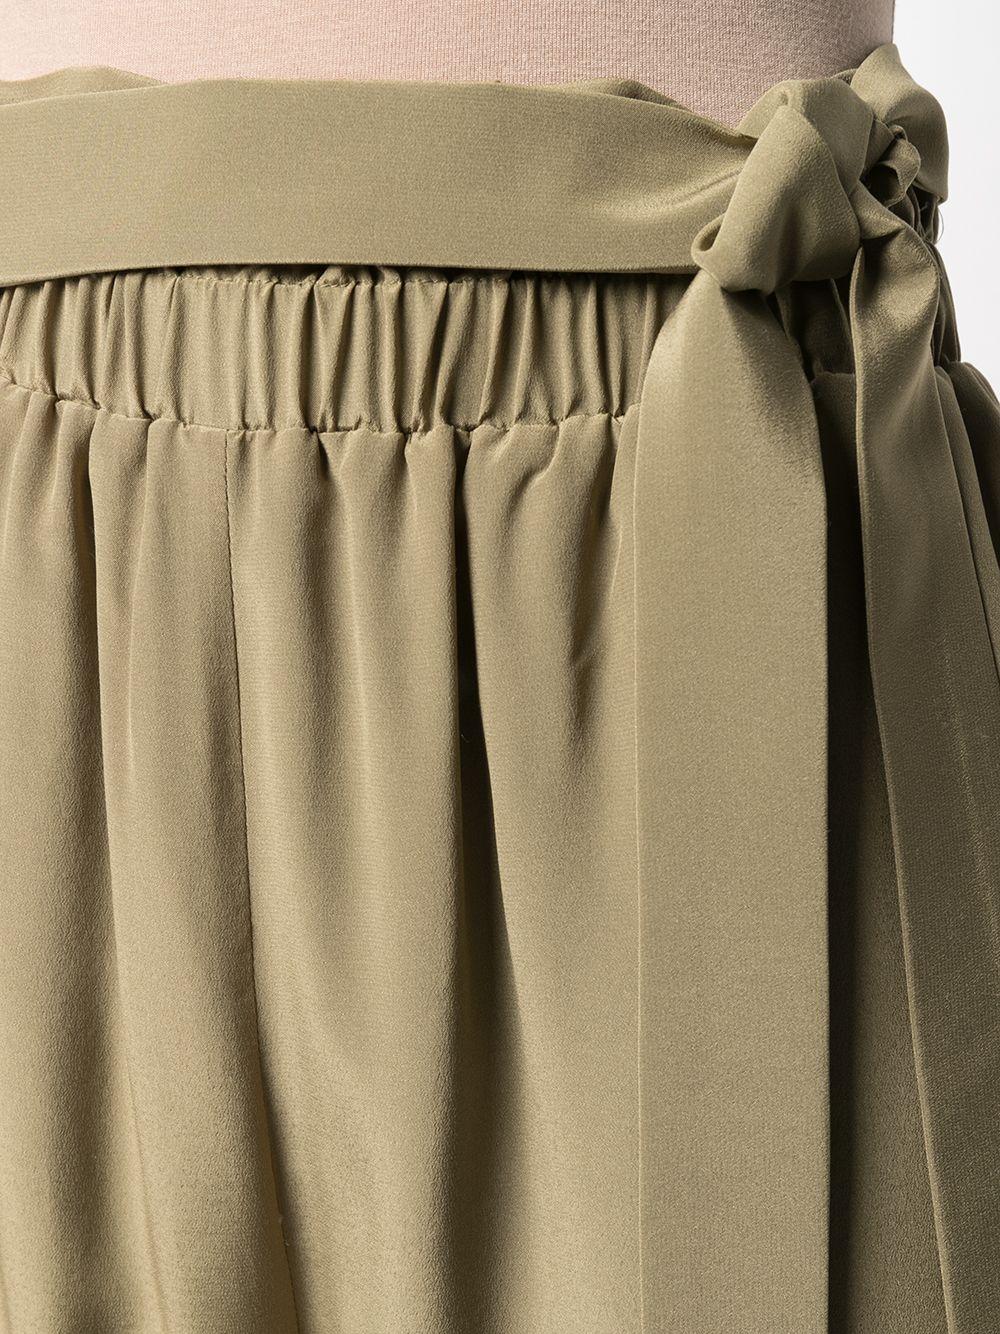 FEDERICA TOSI   Shorts   FTE21SH054.0SE00130007